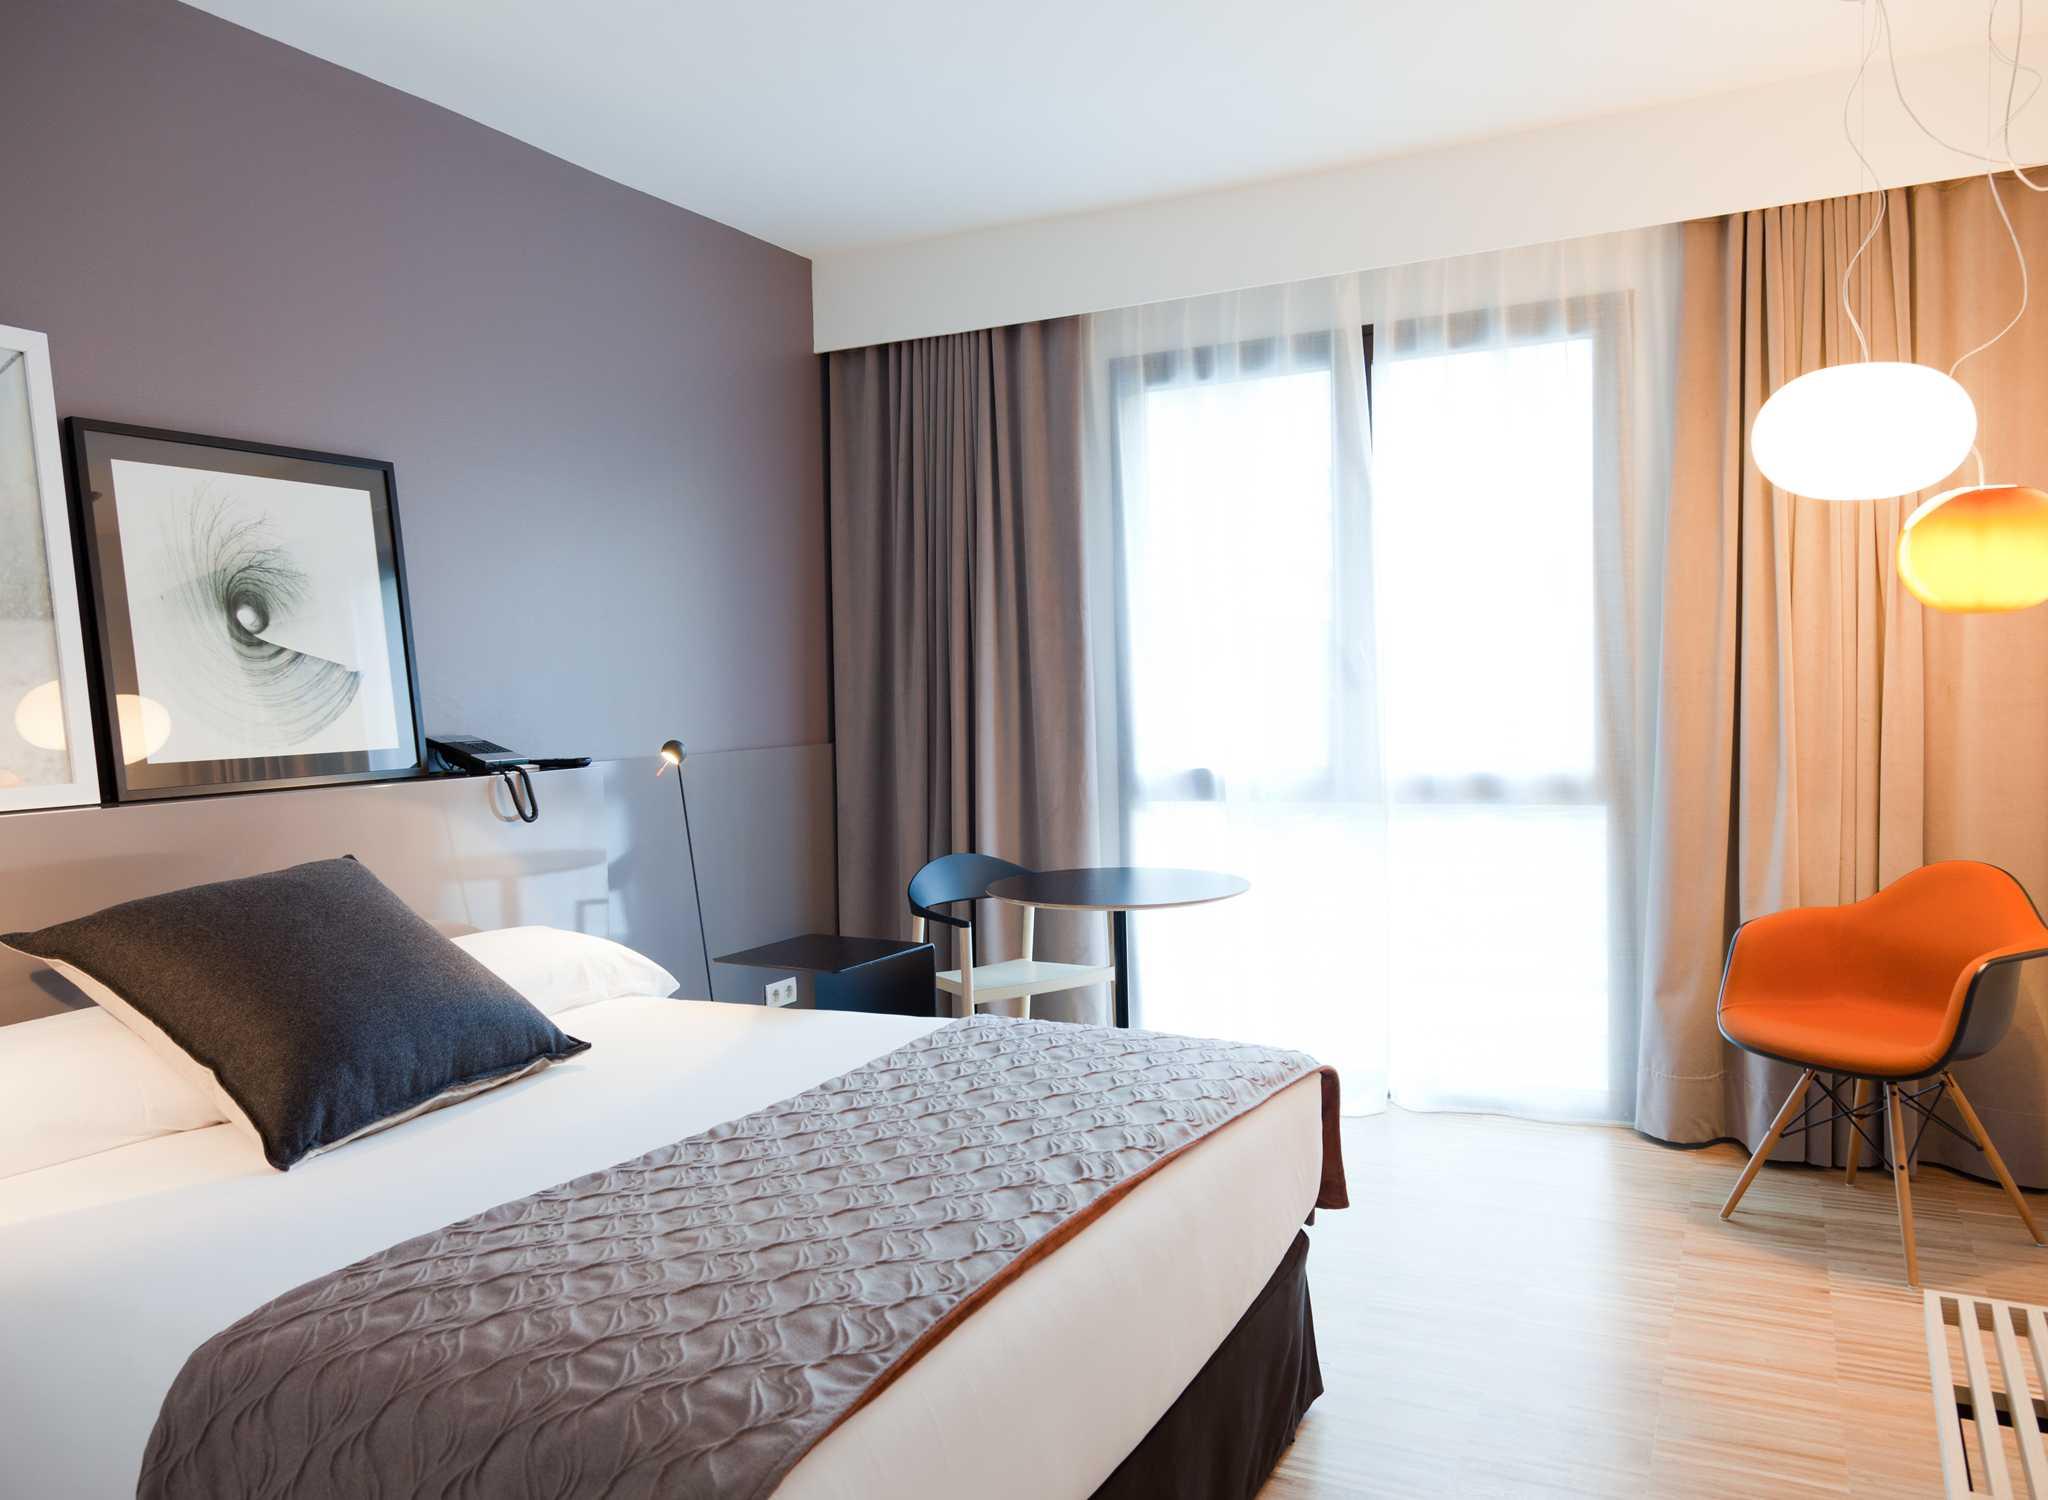 Hoteles en espa a barcelona madrid mallorca hilton for Diseno de habitaciones online